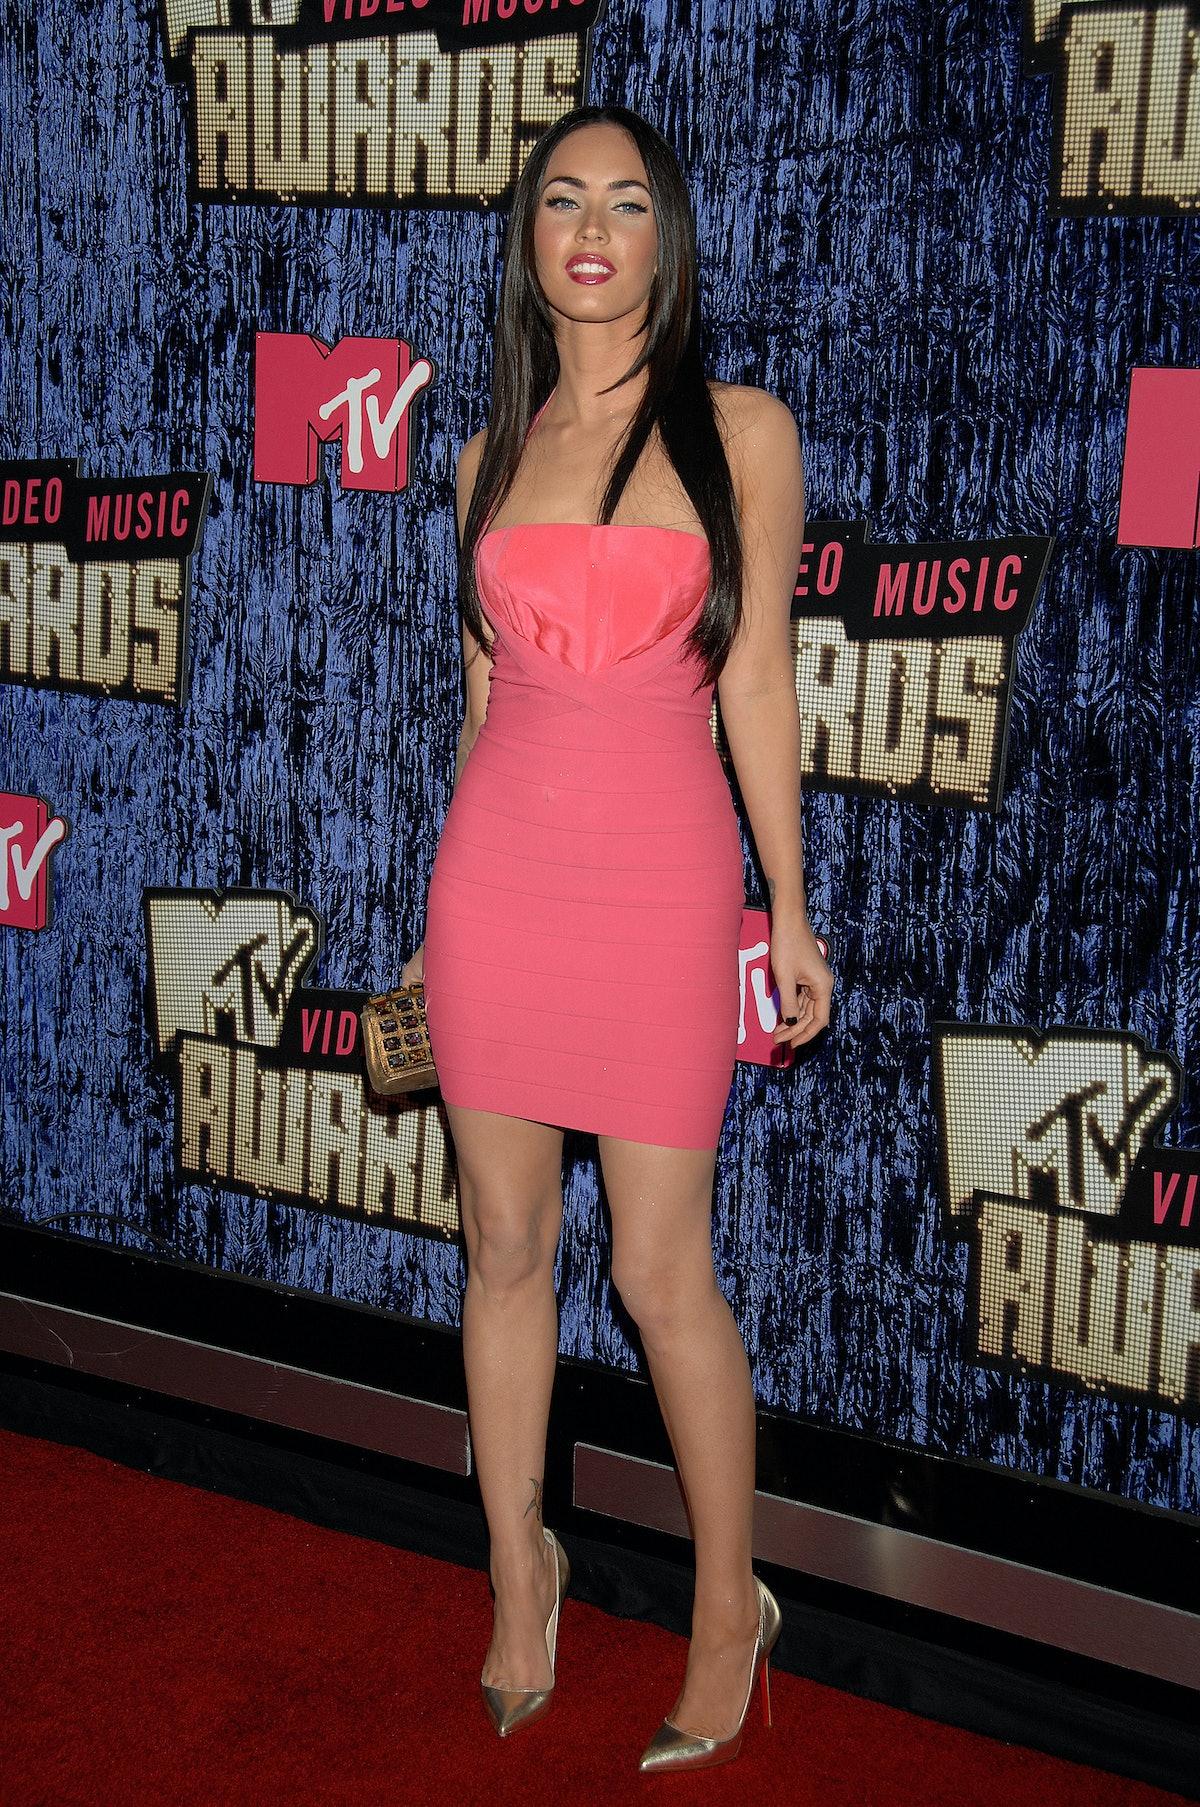 USA - 2007 MTV Video Music Awards - Arrivals